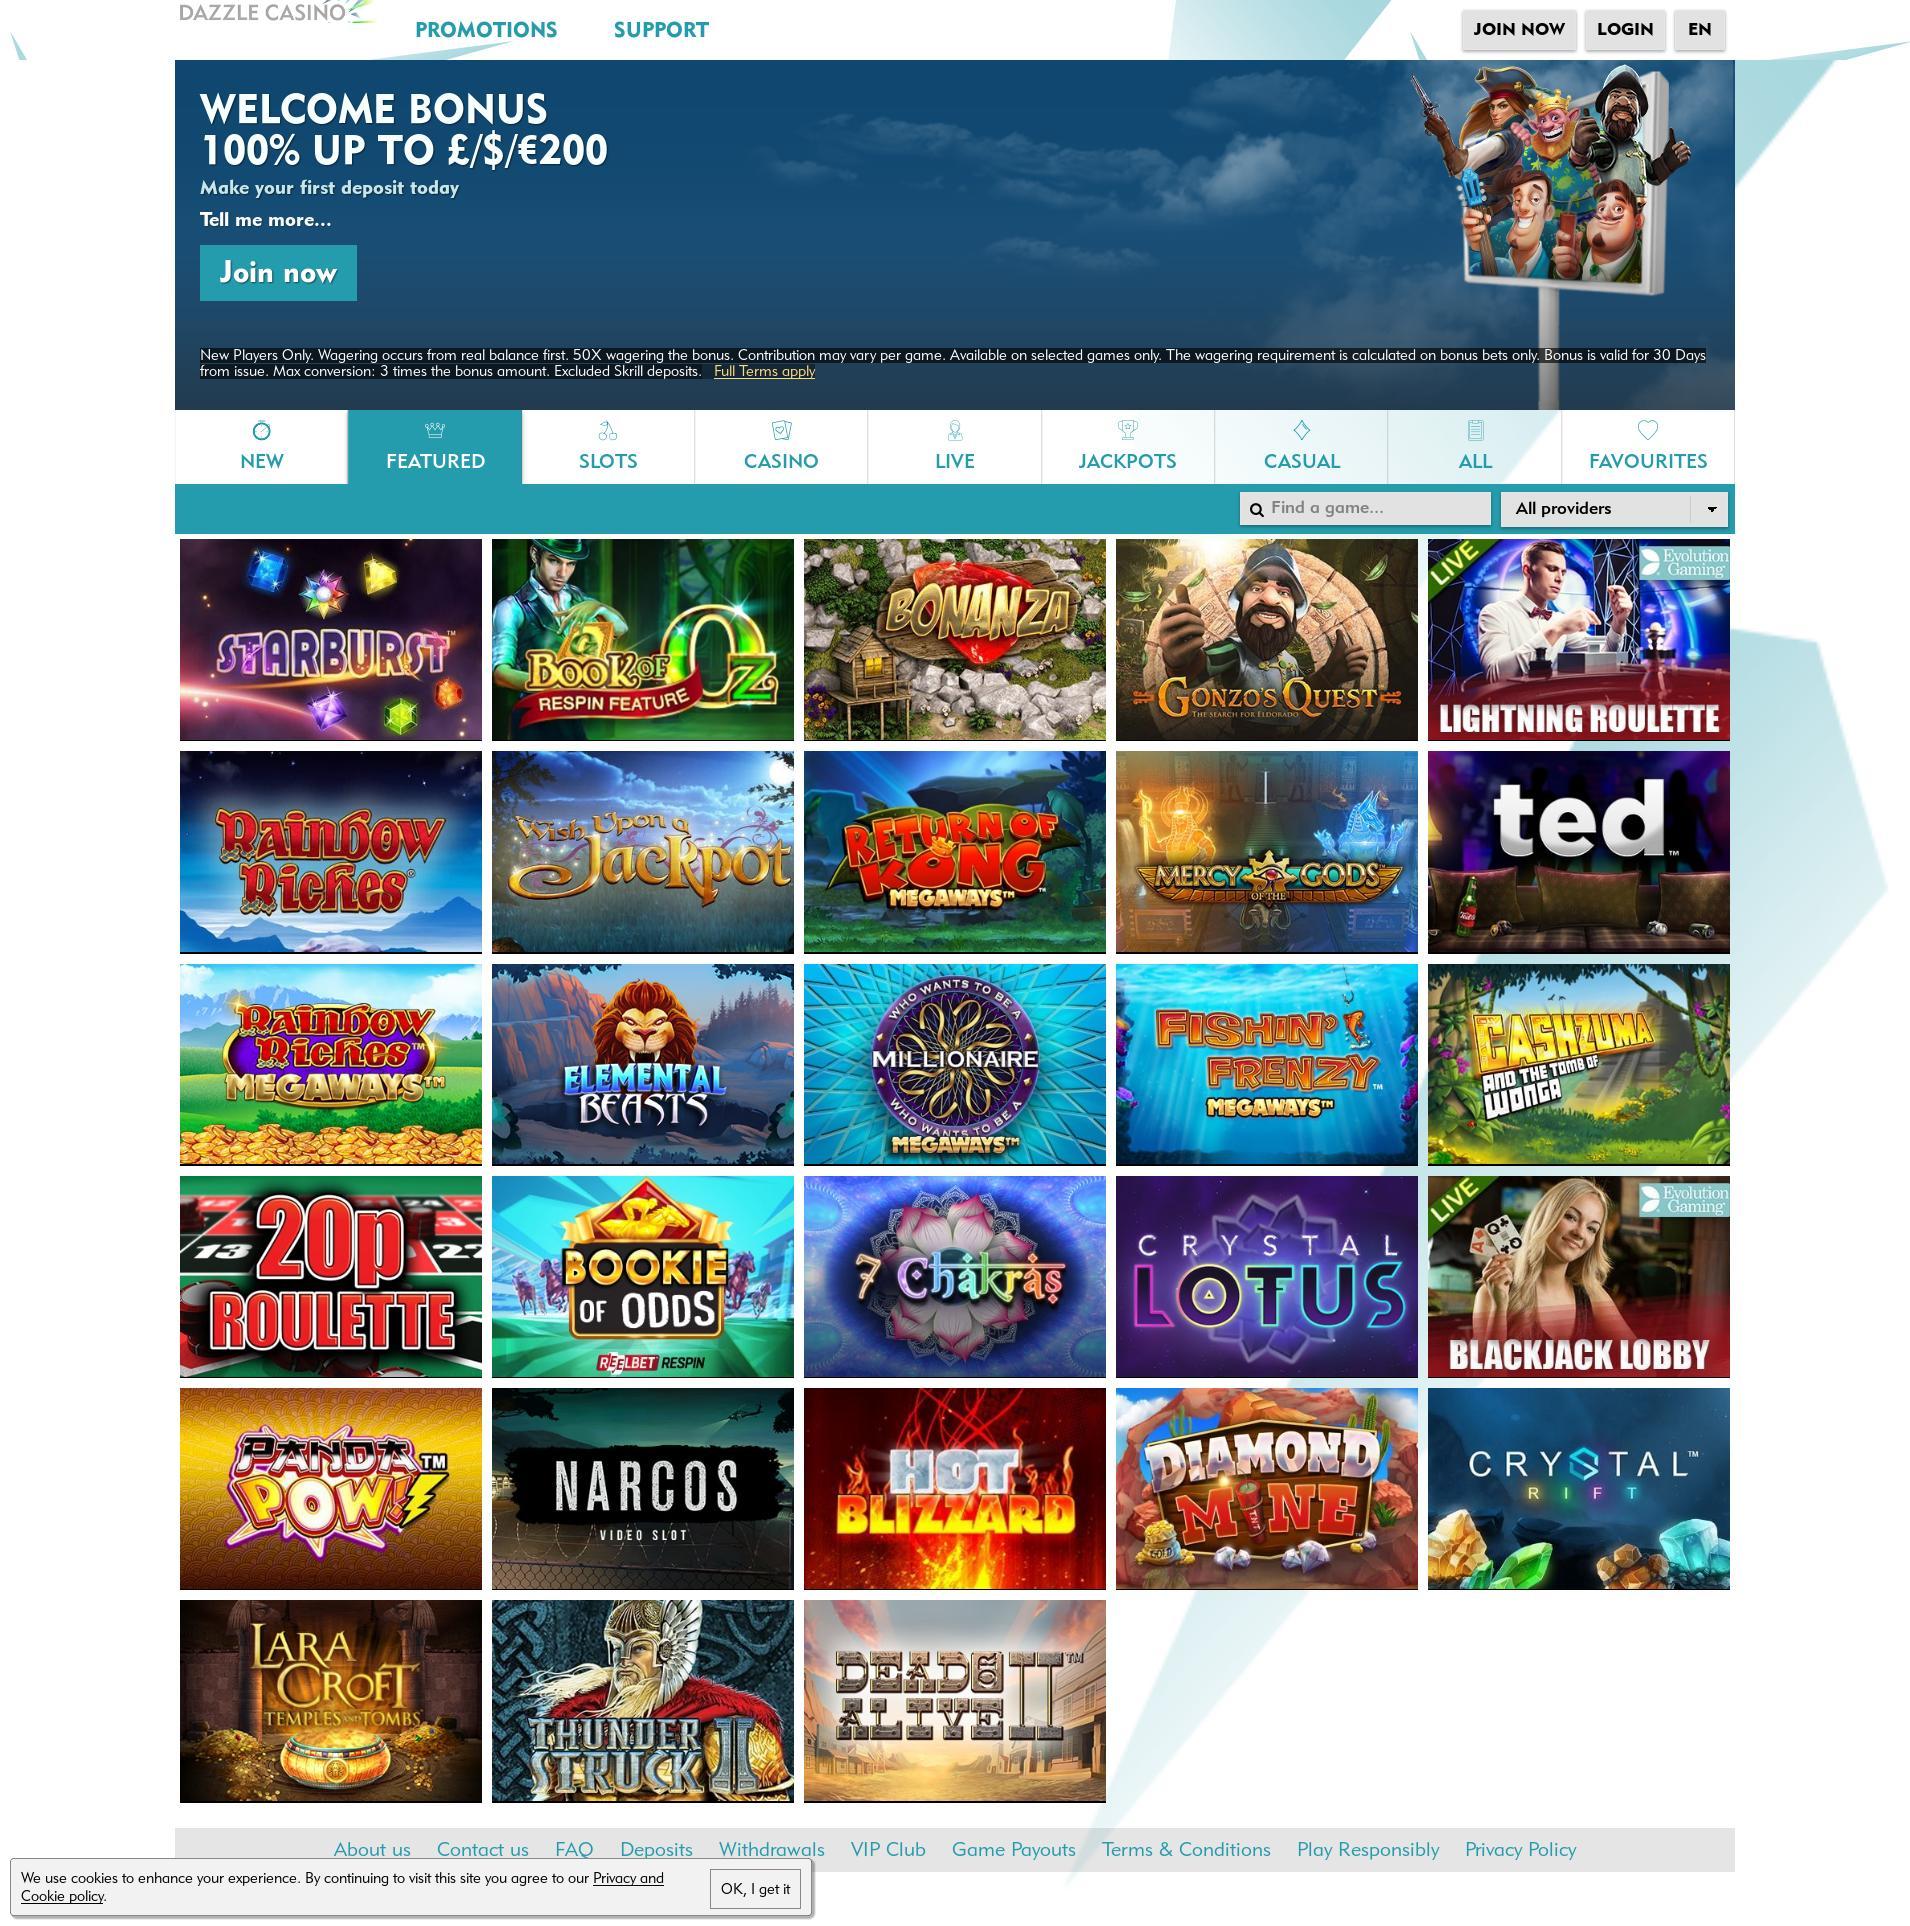 Casino screen Lobby 2019-10-19 for United Kingdom